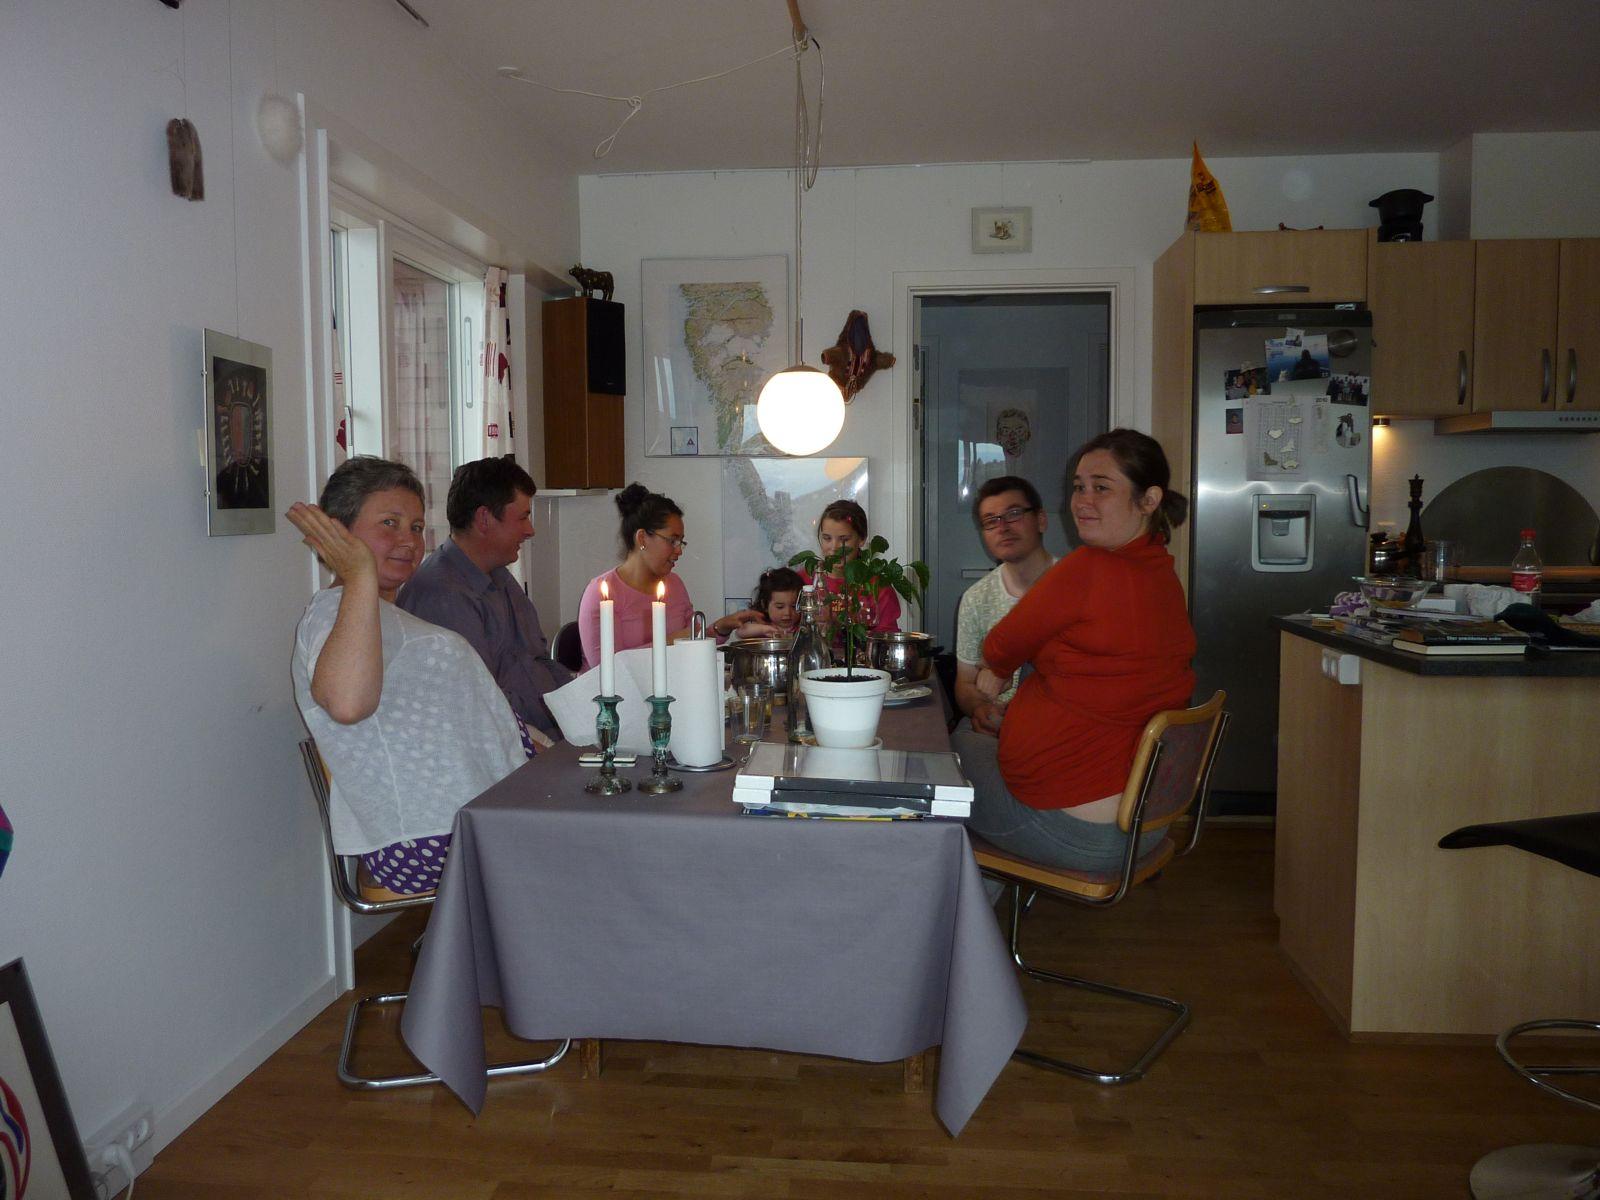 2010-07-29-1904_-_Jesper Eugenius Labansen; Maritha Eugenius Labansen; Martha _Nuka_ Platou; Mette Labansen; Qupanuk _2